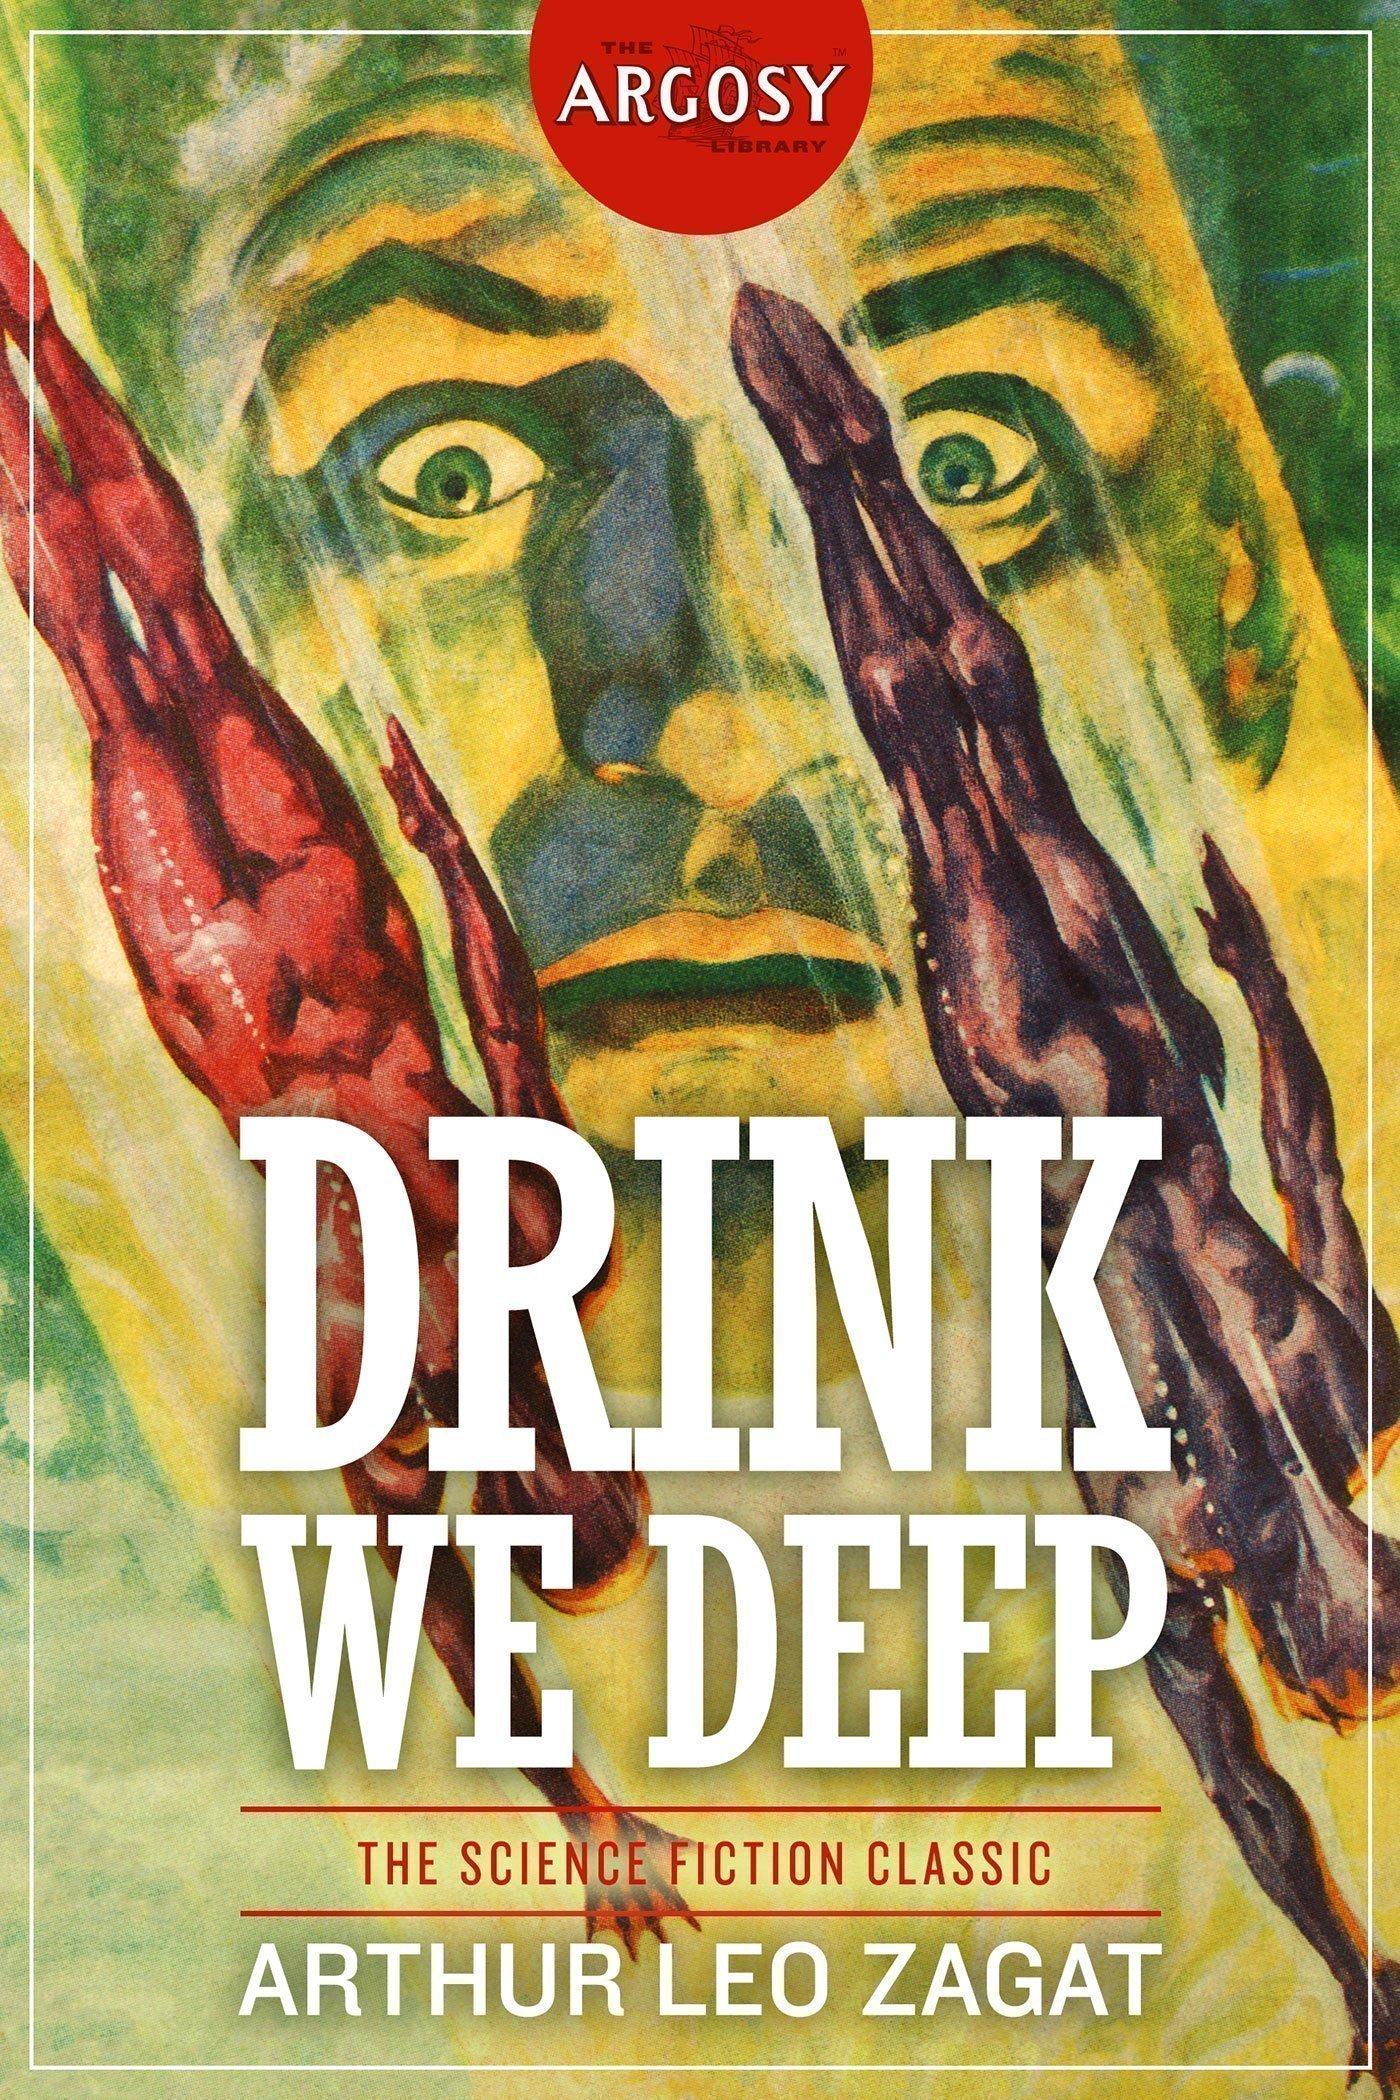 Drink We Deep (The Argosy Library) by Arthur Leo Zagat